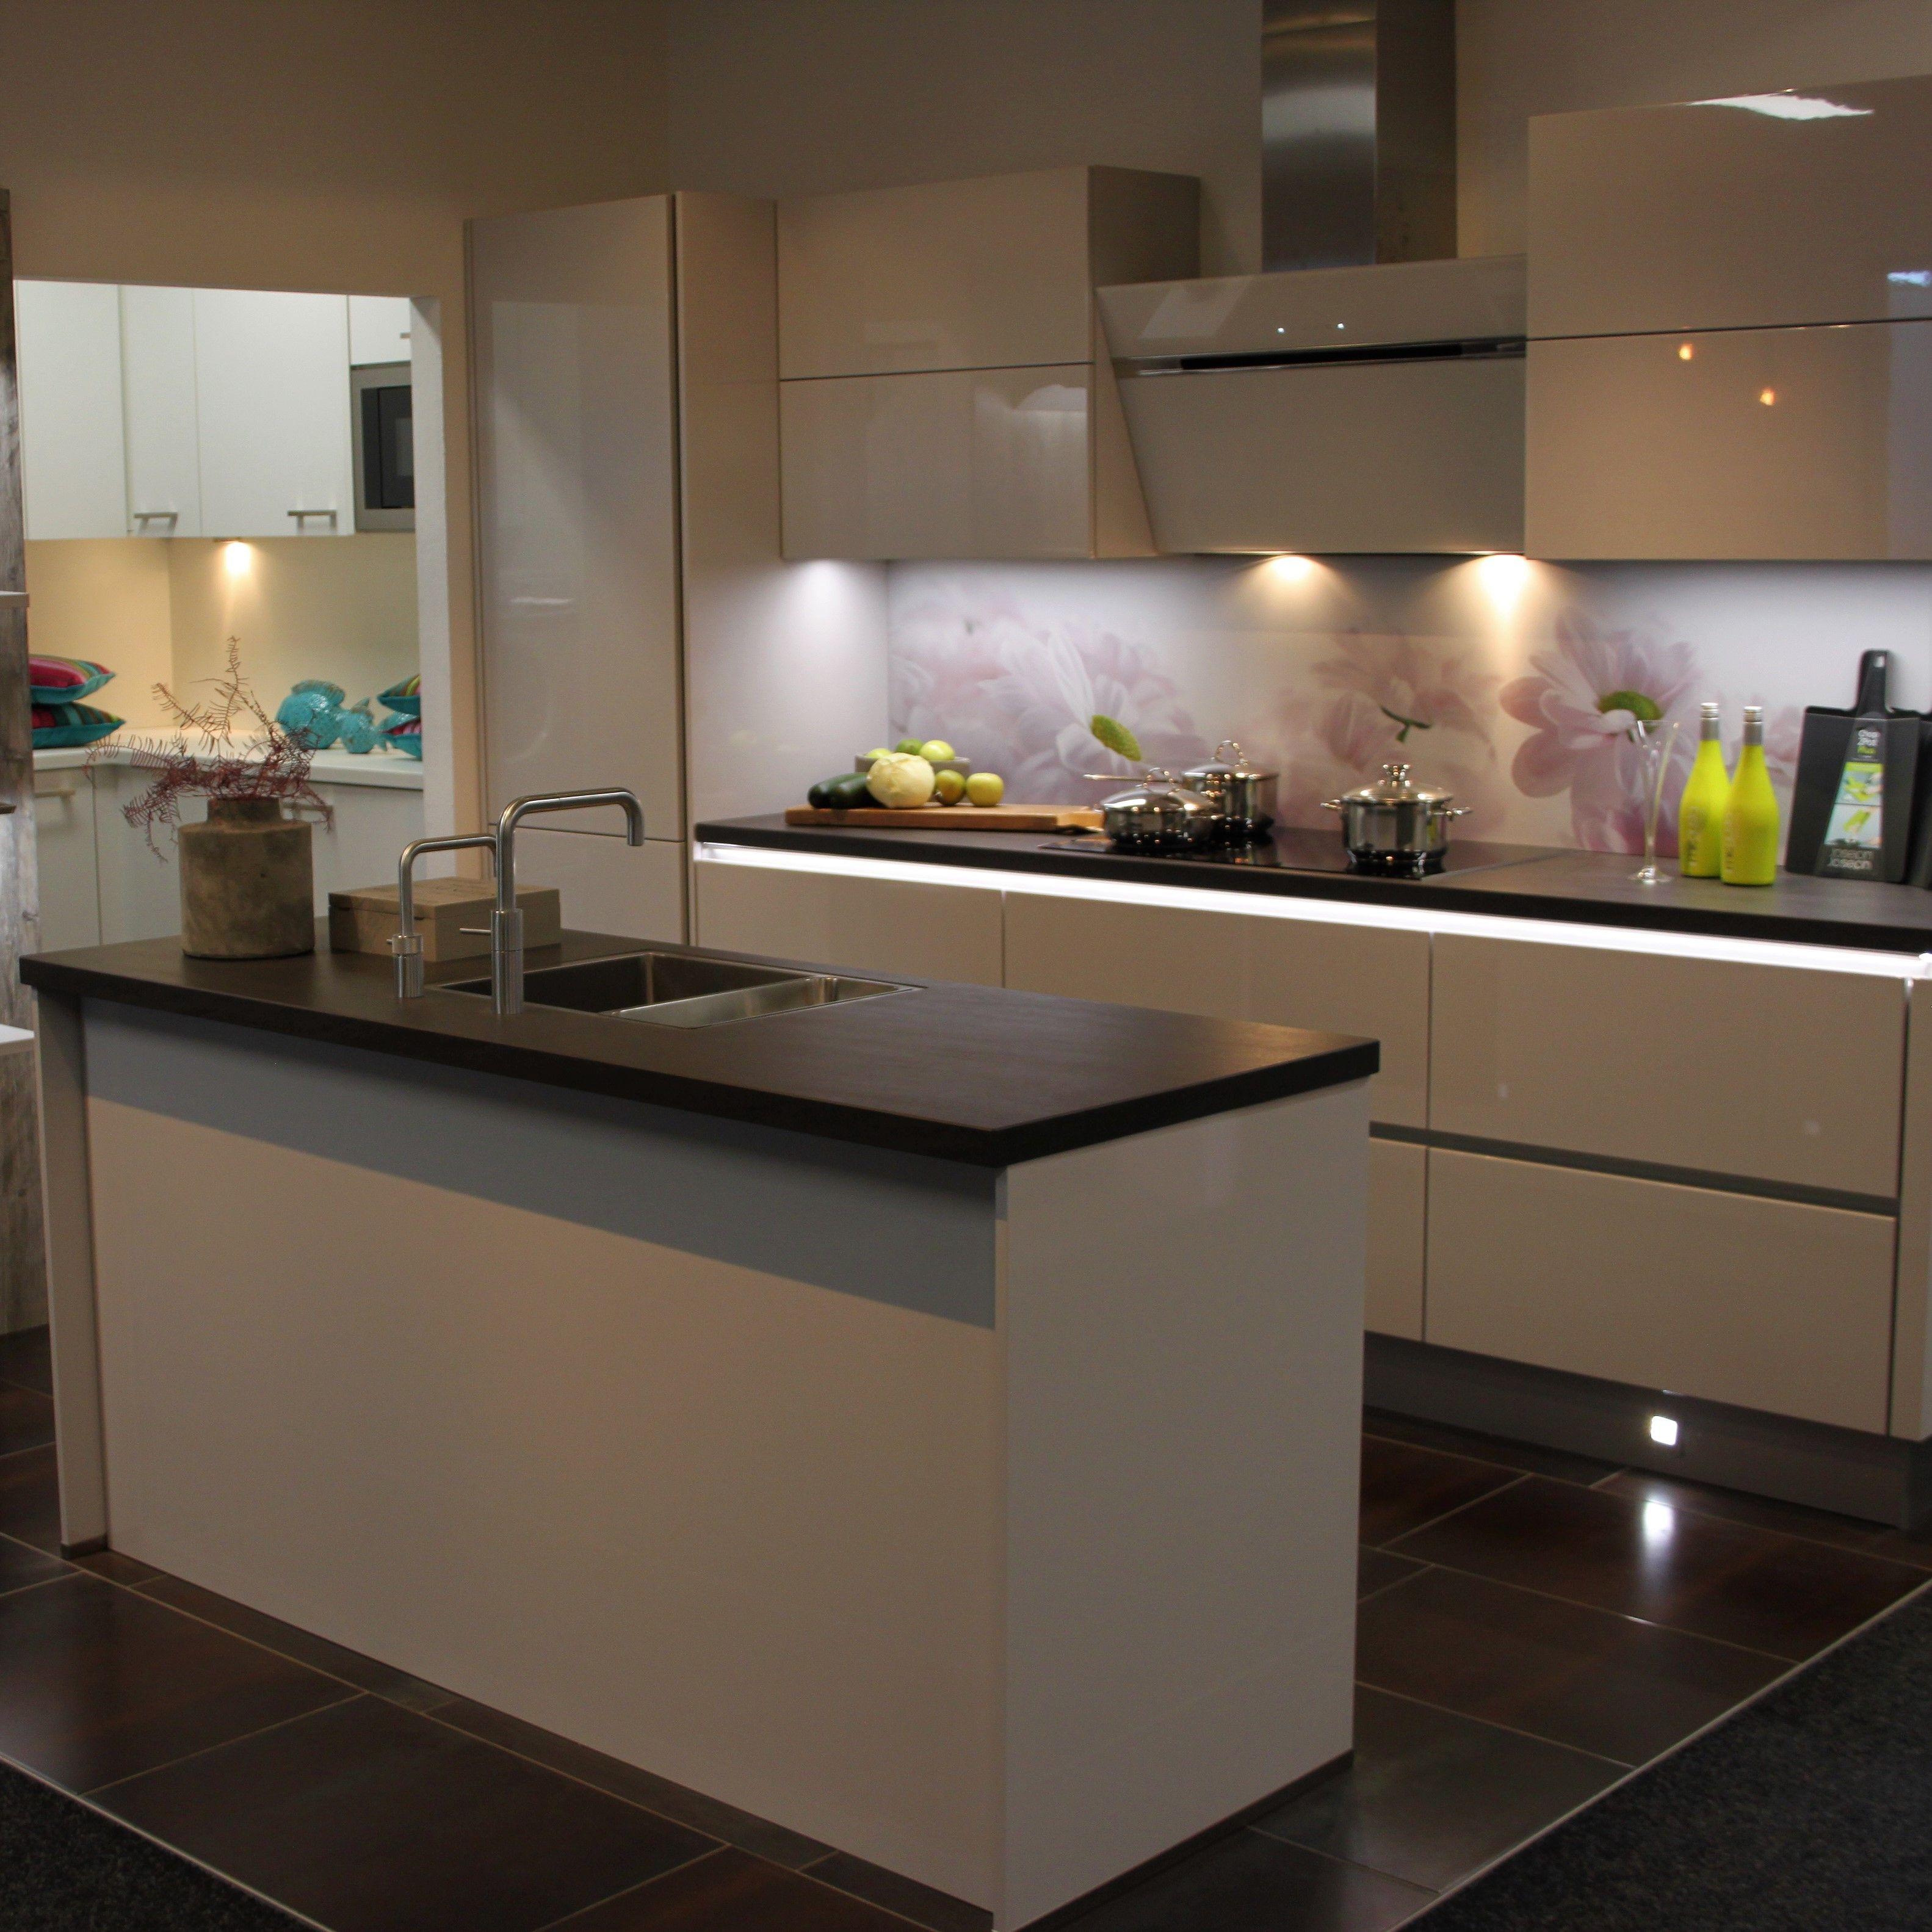 Showroom keuken sense keukens greeploos wit keramiek for Werkblad keuken keramiek